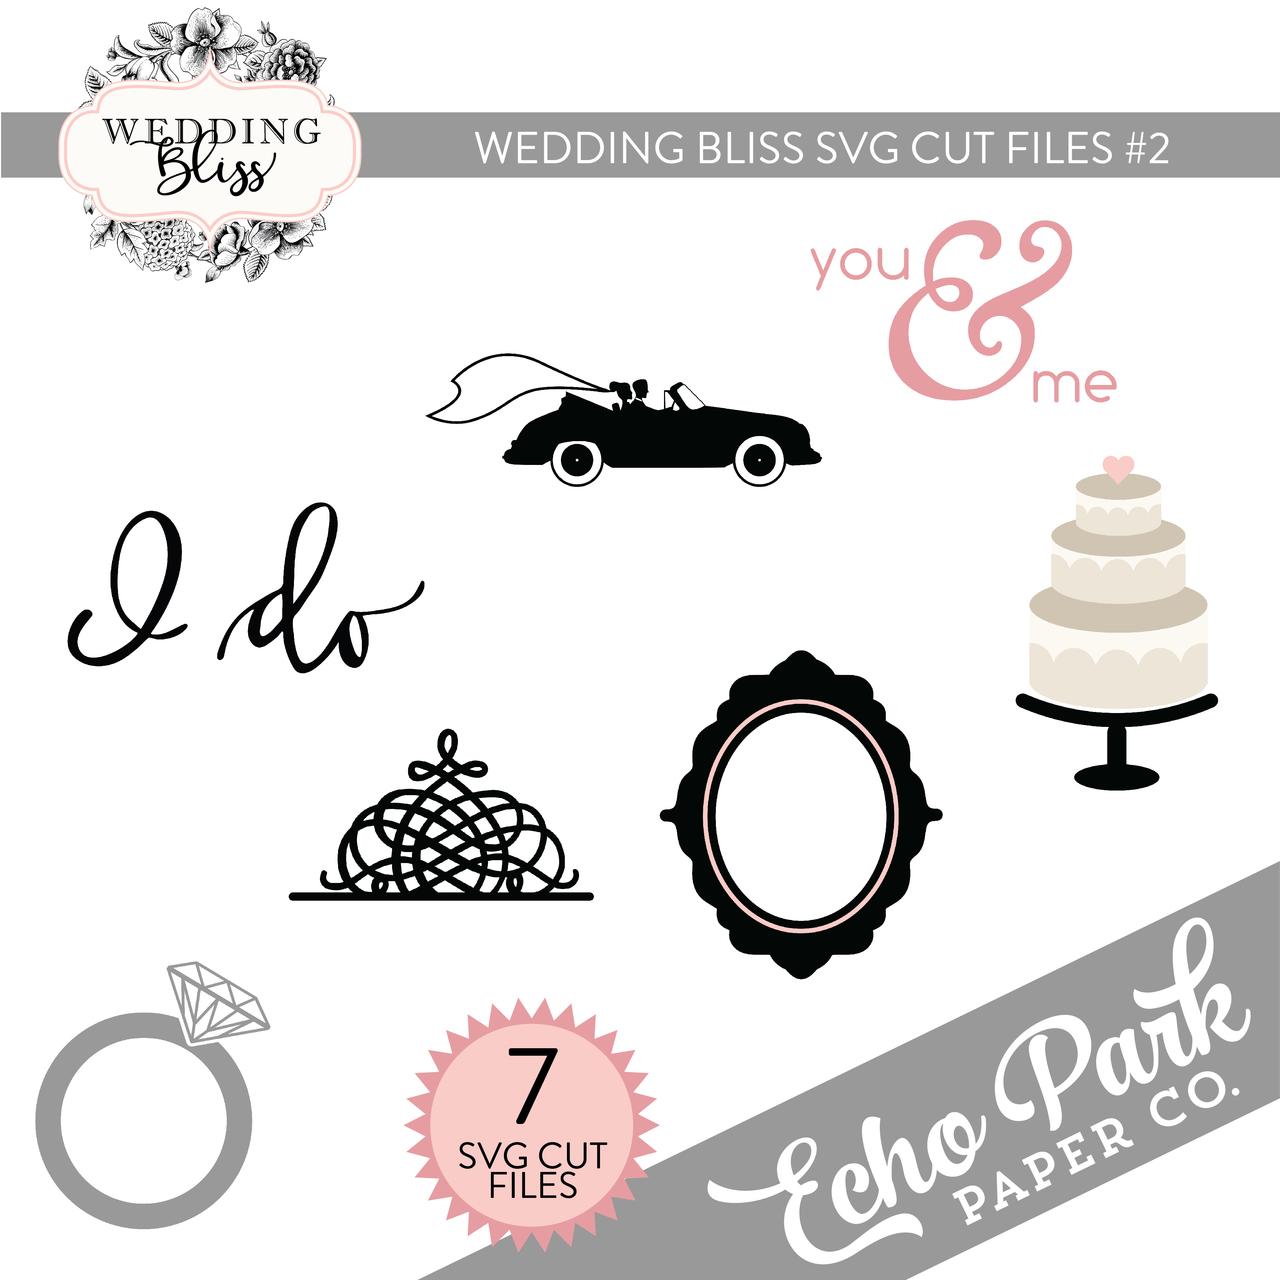 Wedding Bliss SVG Cut Files #2